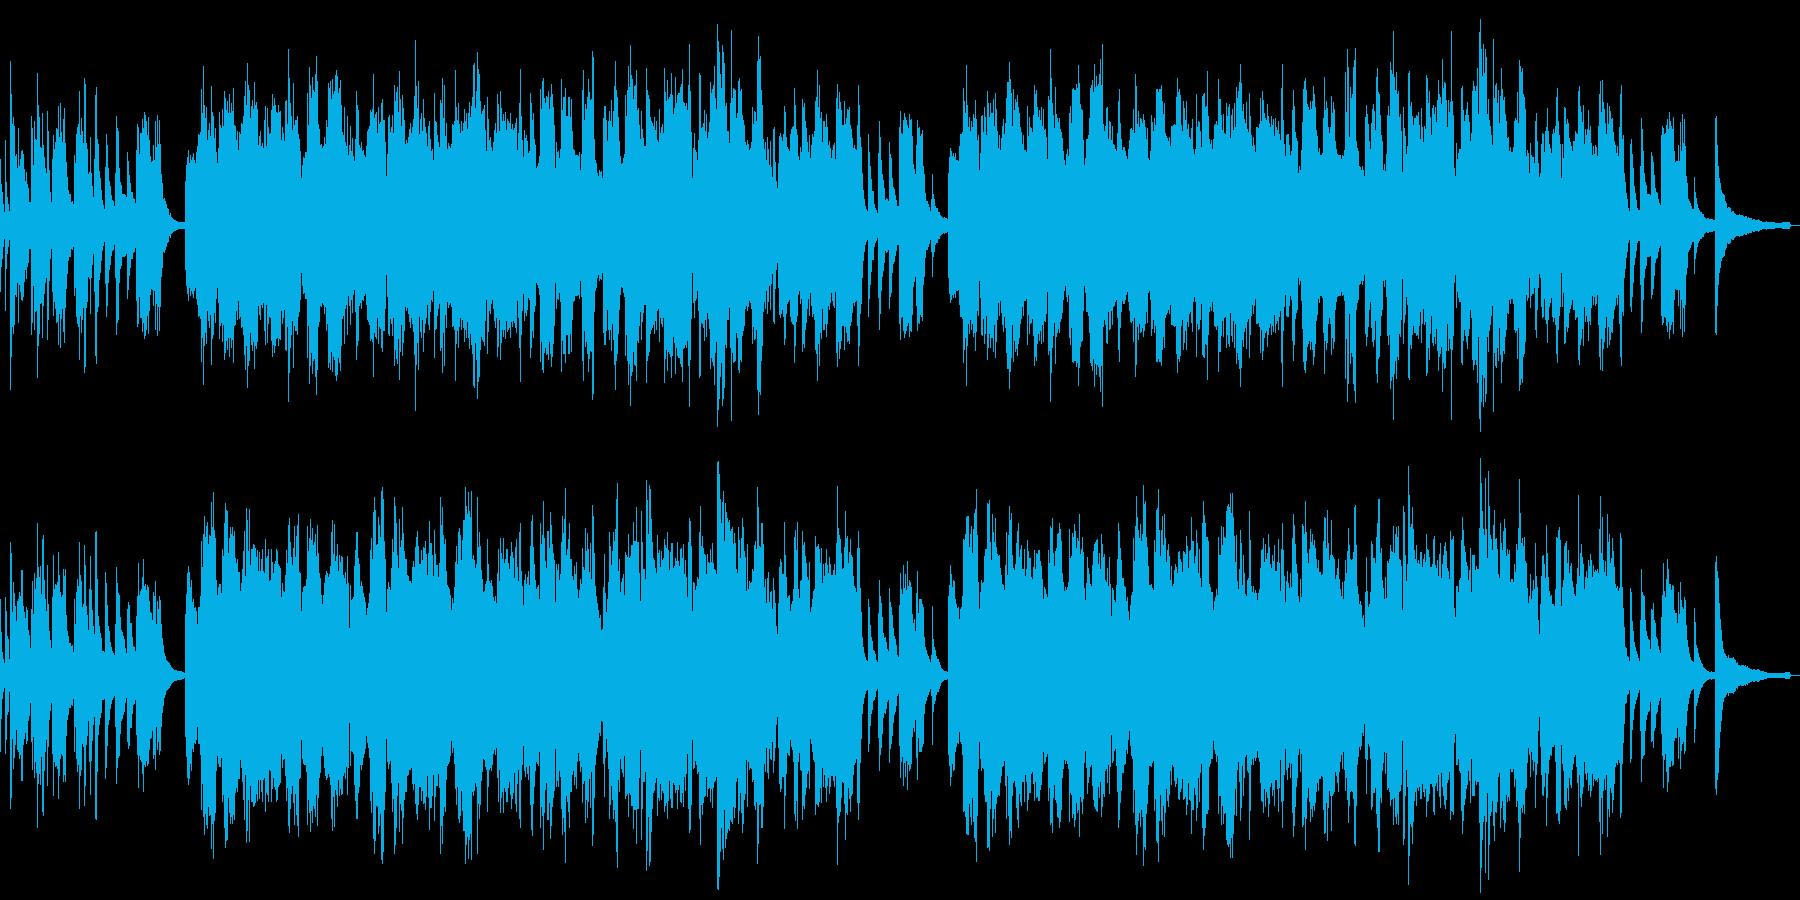 DannyBoyダニーボーイ オーボエの再生済みの波形